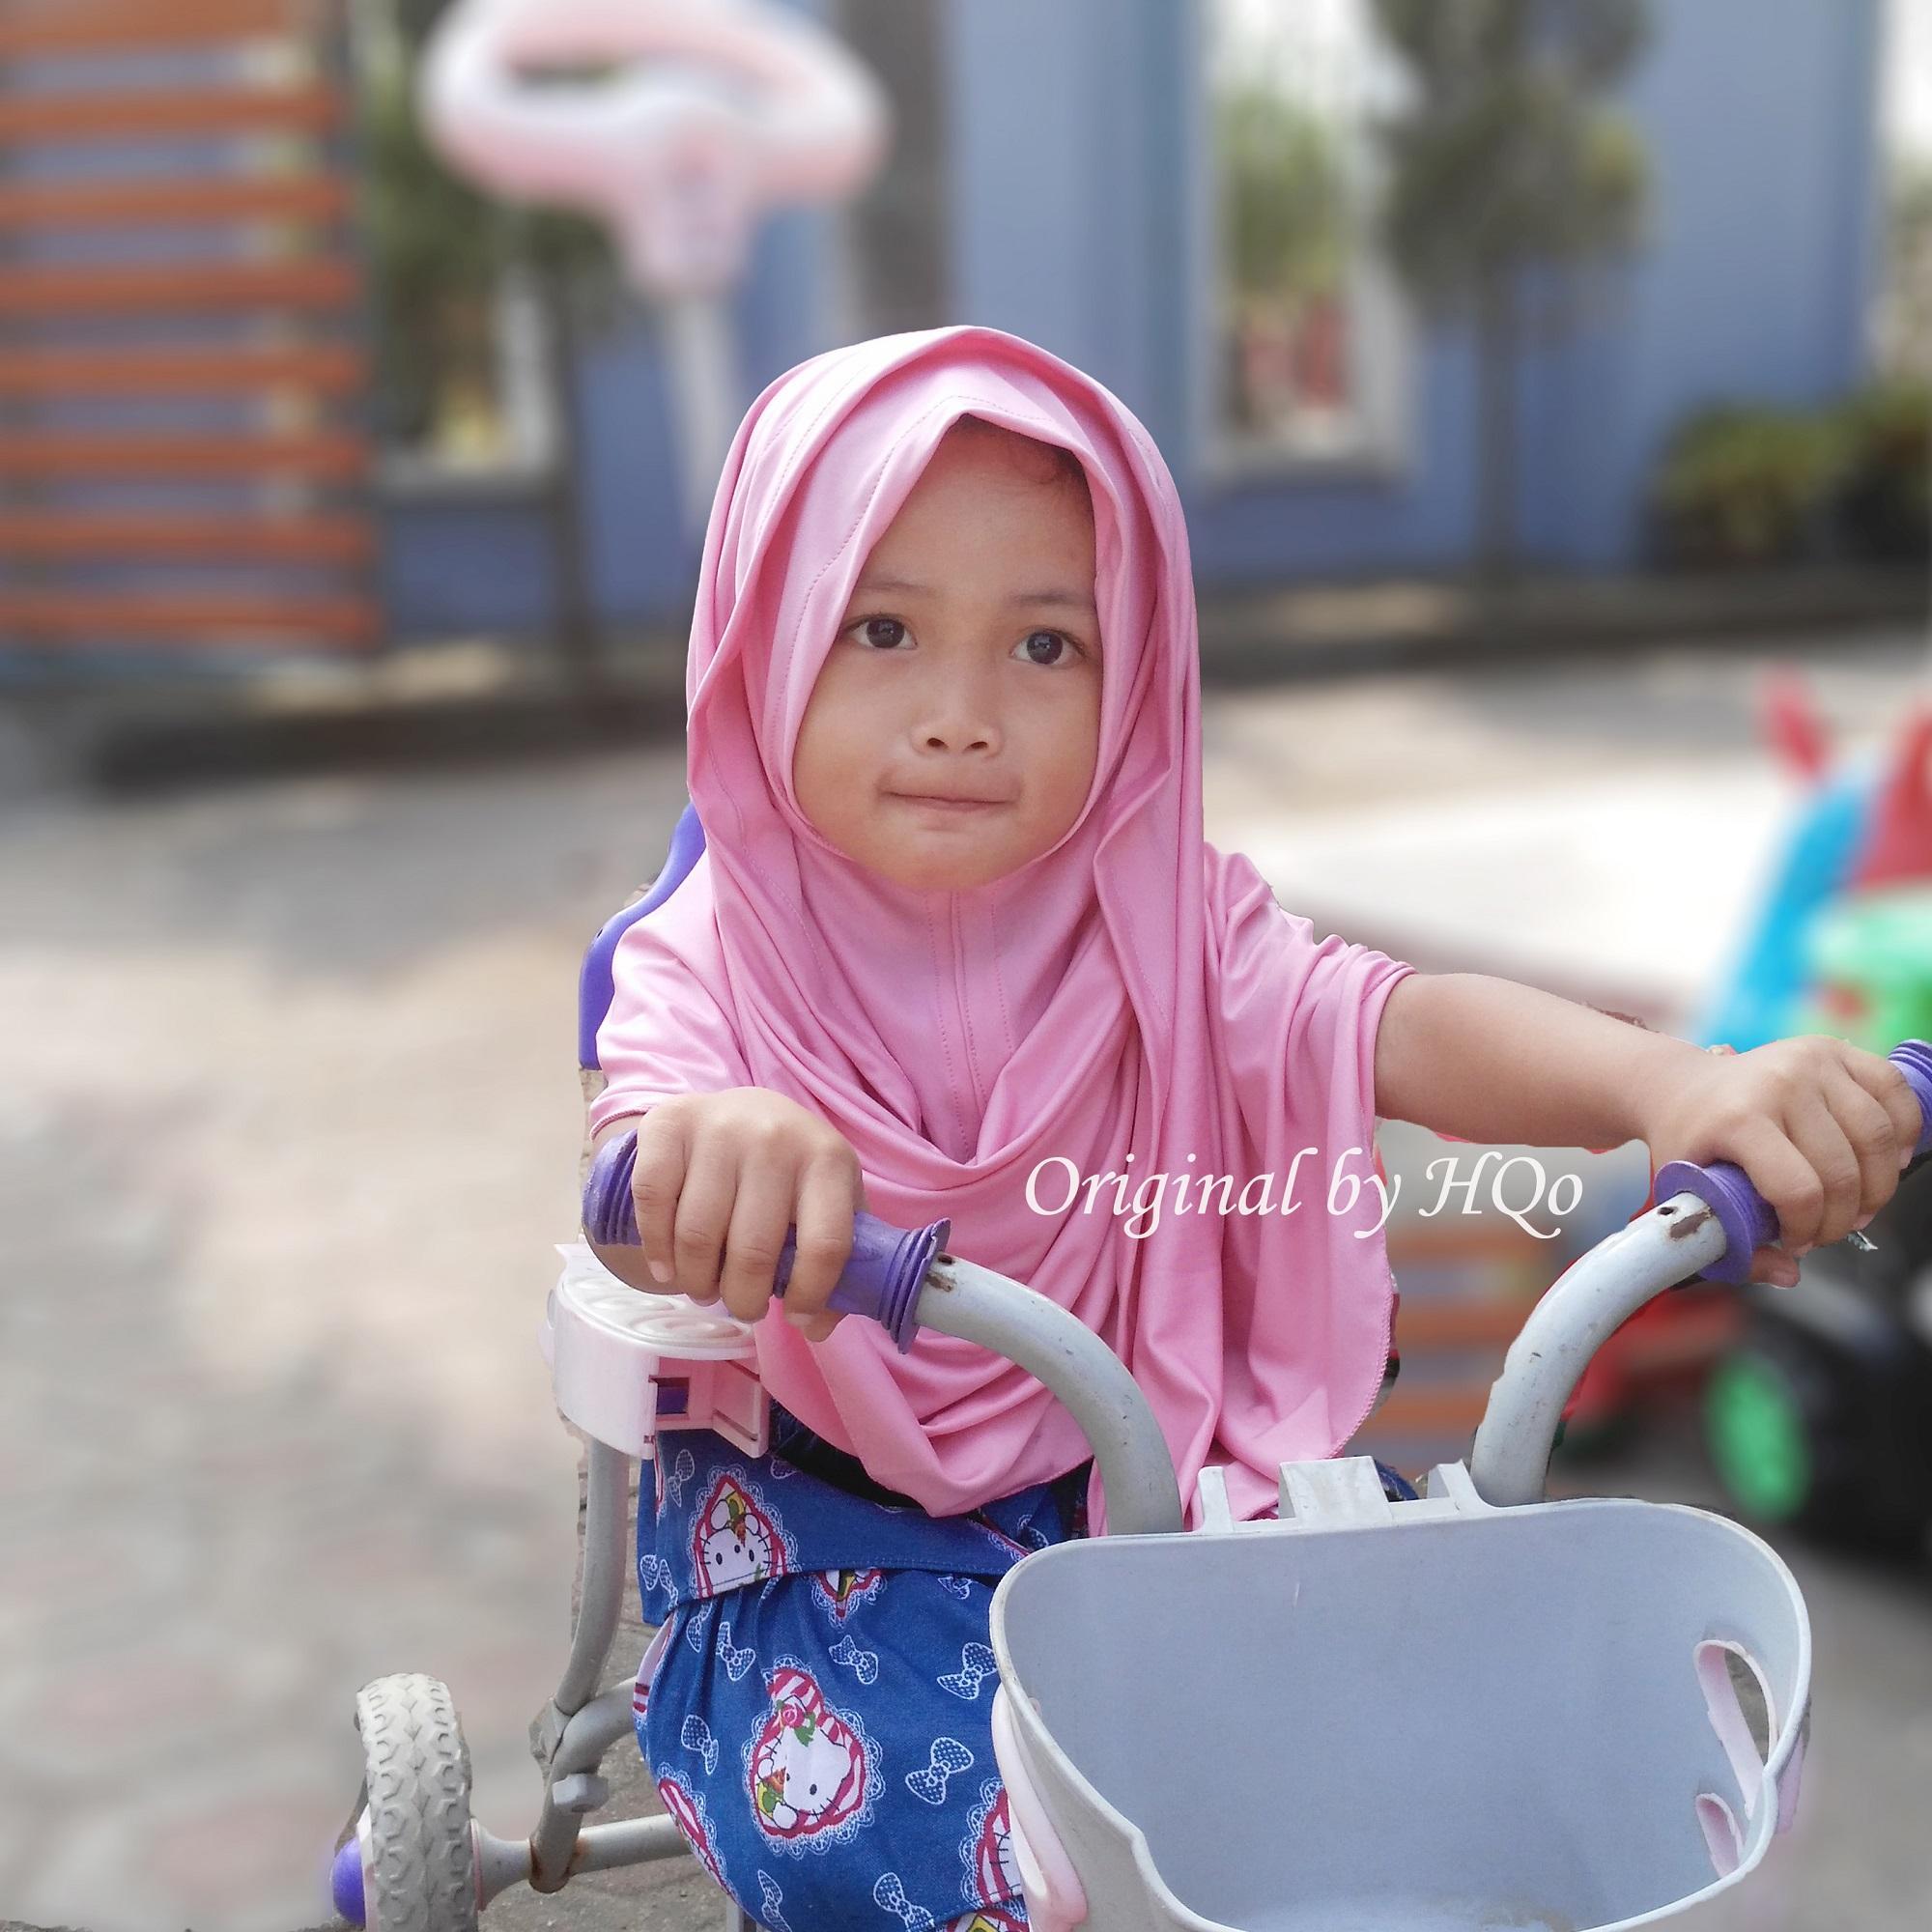 HQo Kerudung Anak Bayi / Jilbab Anak Lucu / Hijab Anak / Pashmina Anak / Pasmina Anak / Pasmini / Jilbab Anak Modis / Kerudung Anak Murah / Kerudung Rabbani / Model Jilbab Anak Terbaru Naia - Pink